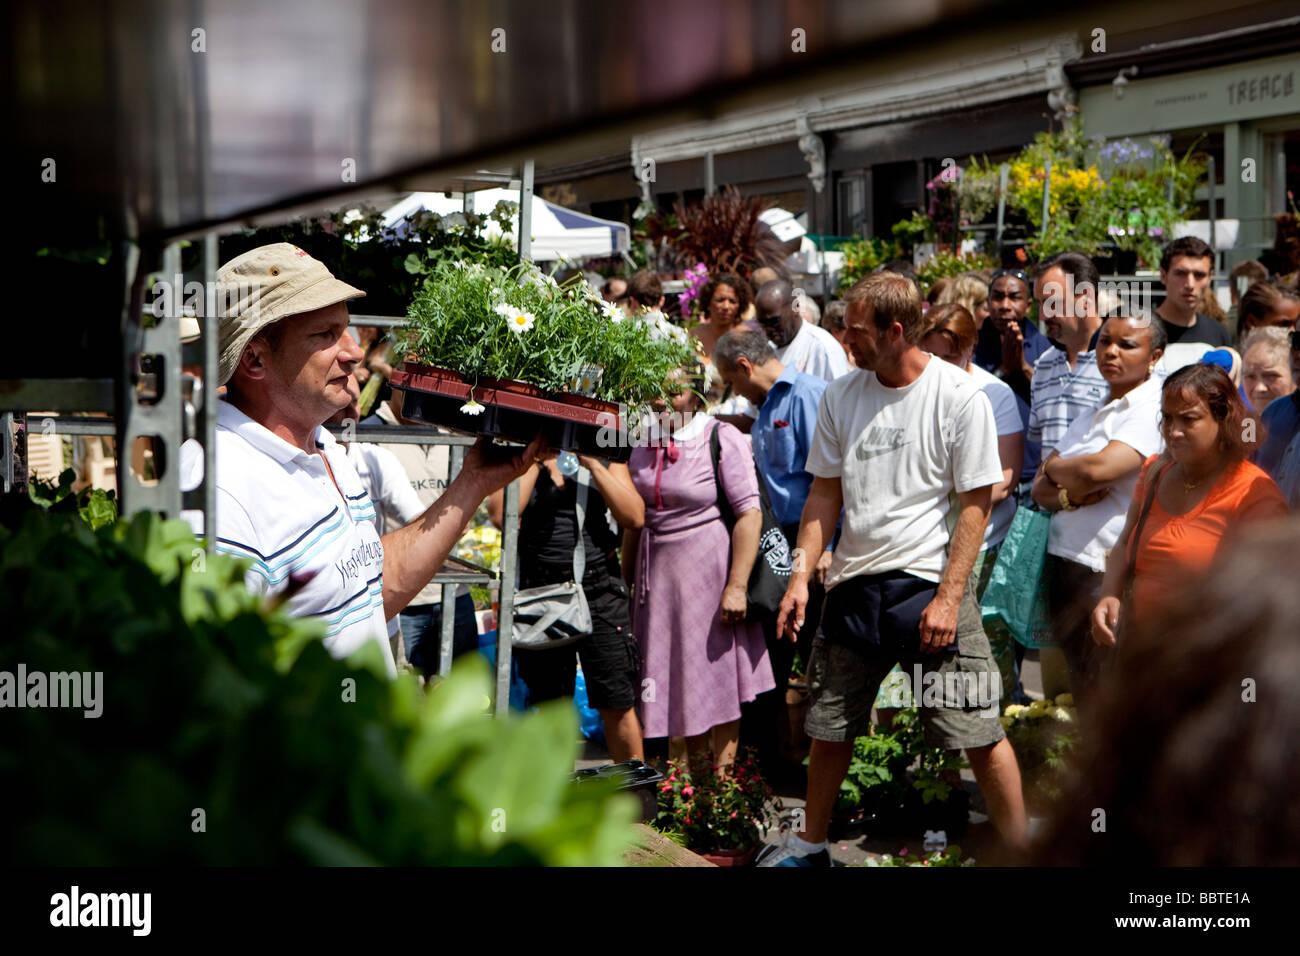 Columbia Road Flower Market, London - Stock Image